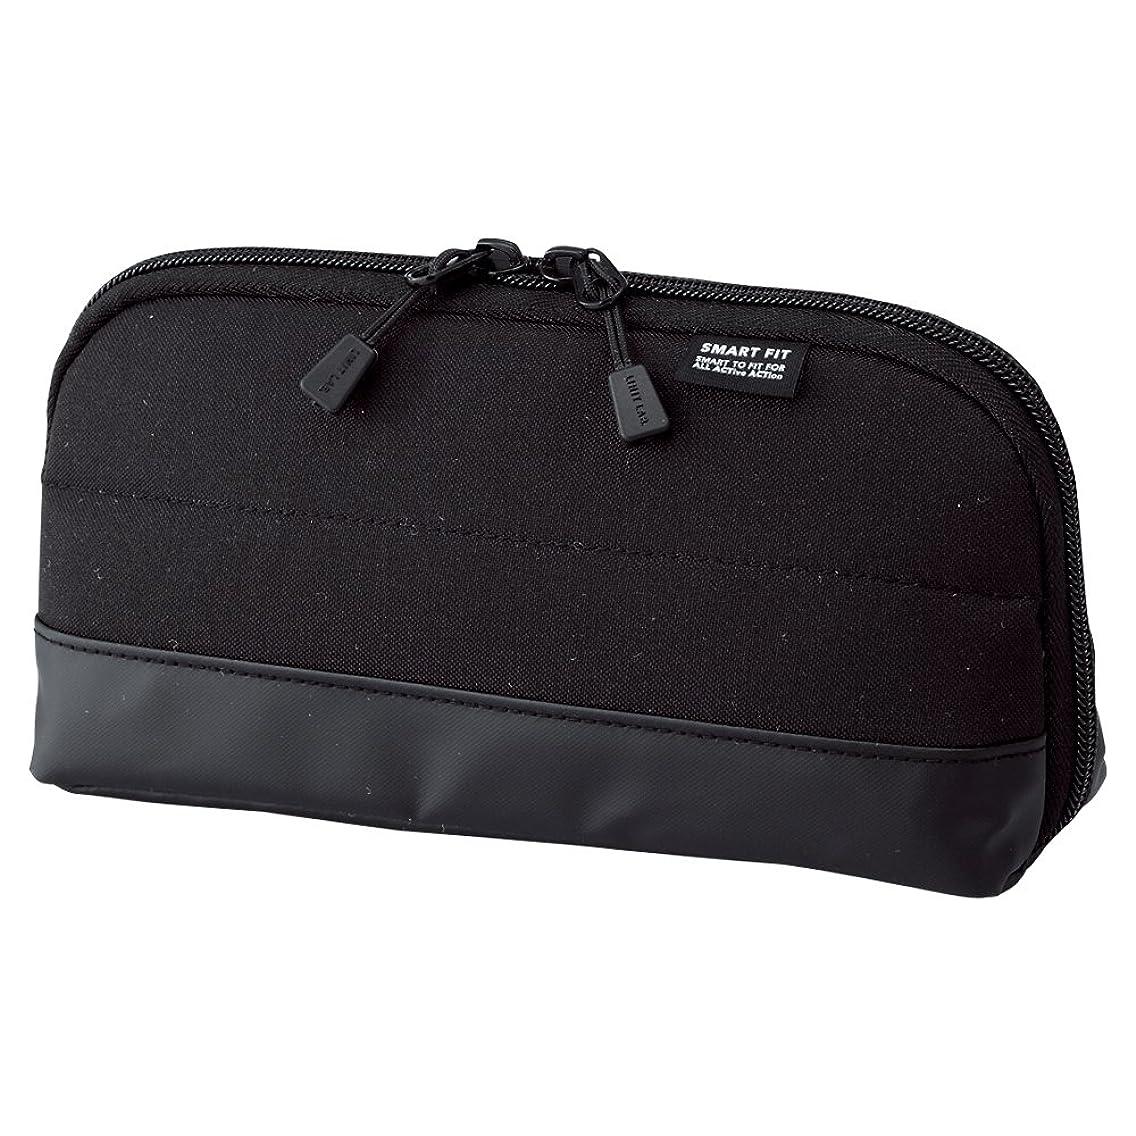 LIHIT LAB. Pen Case (Pencil Case), Water & Stain Repellent, Black, 8